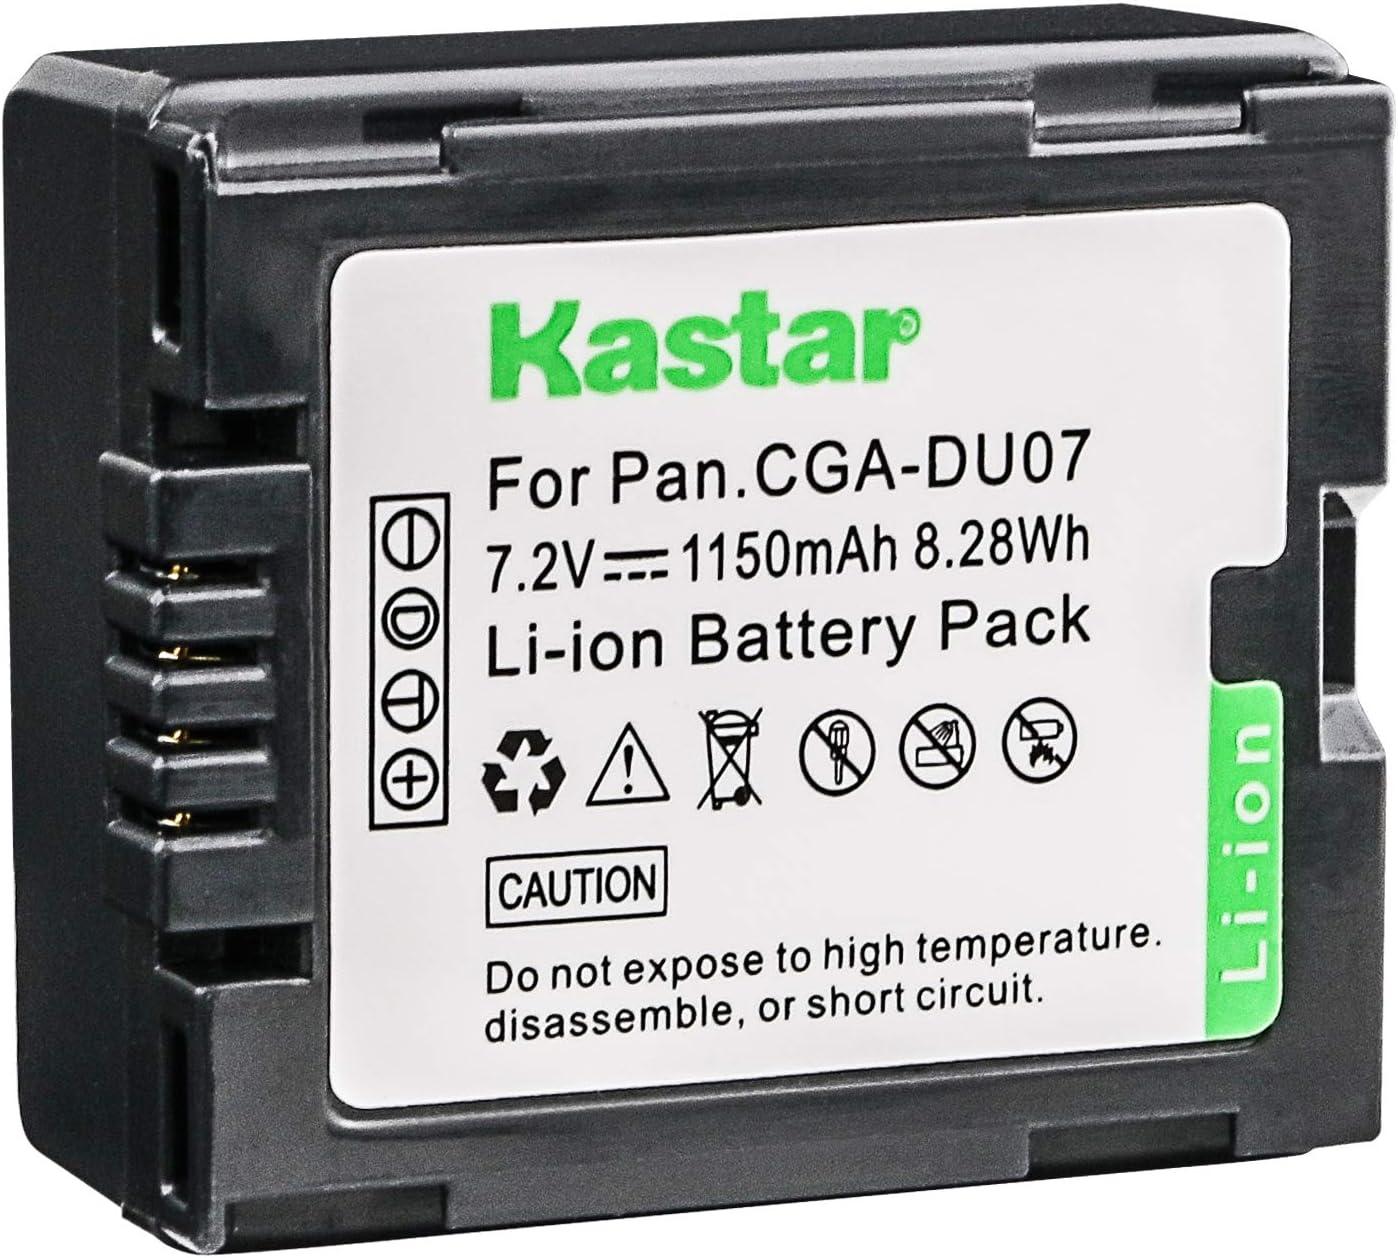 Amazon Com Kastar Camcorder Battery Replacement For Panasonic Cgr Du06 Cga Du06 Cgr Du07 Cga Du07 Cgr Du14 Cga Du14 Cgr Du21 Cga Du21 And Hitachi Dz Bp14s Dz Bp7s Dz Bp21sj Battery Camera Photo